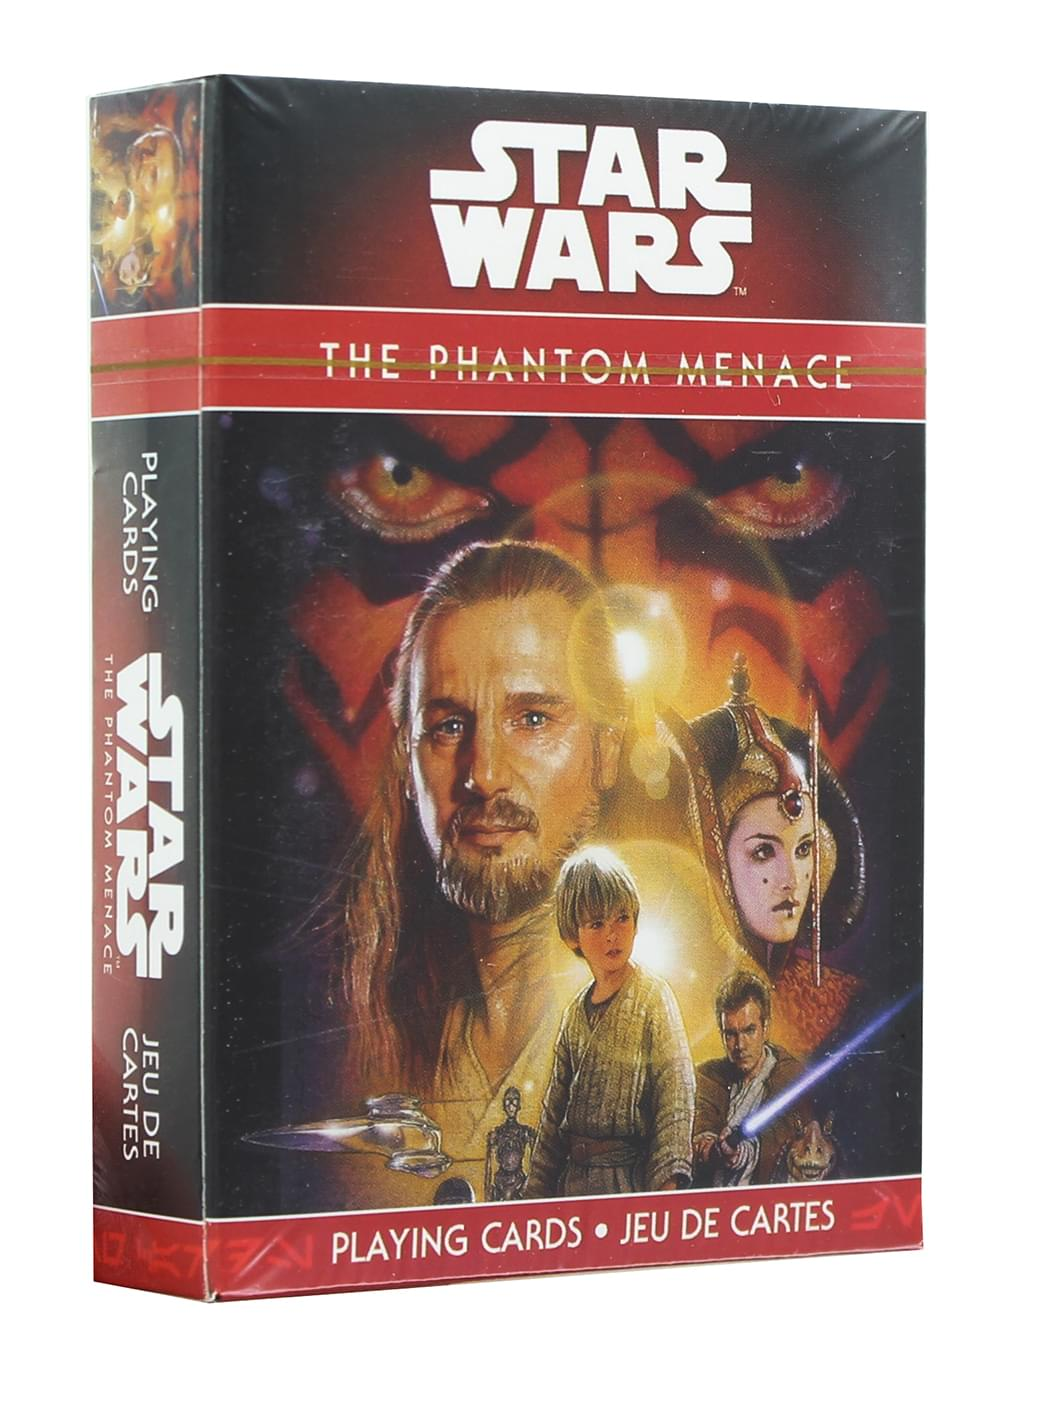 Star Wars The Phantom Menace Playing Cards